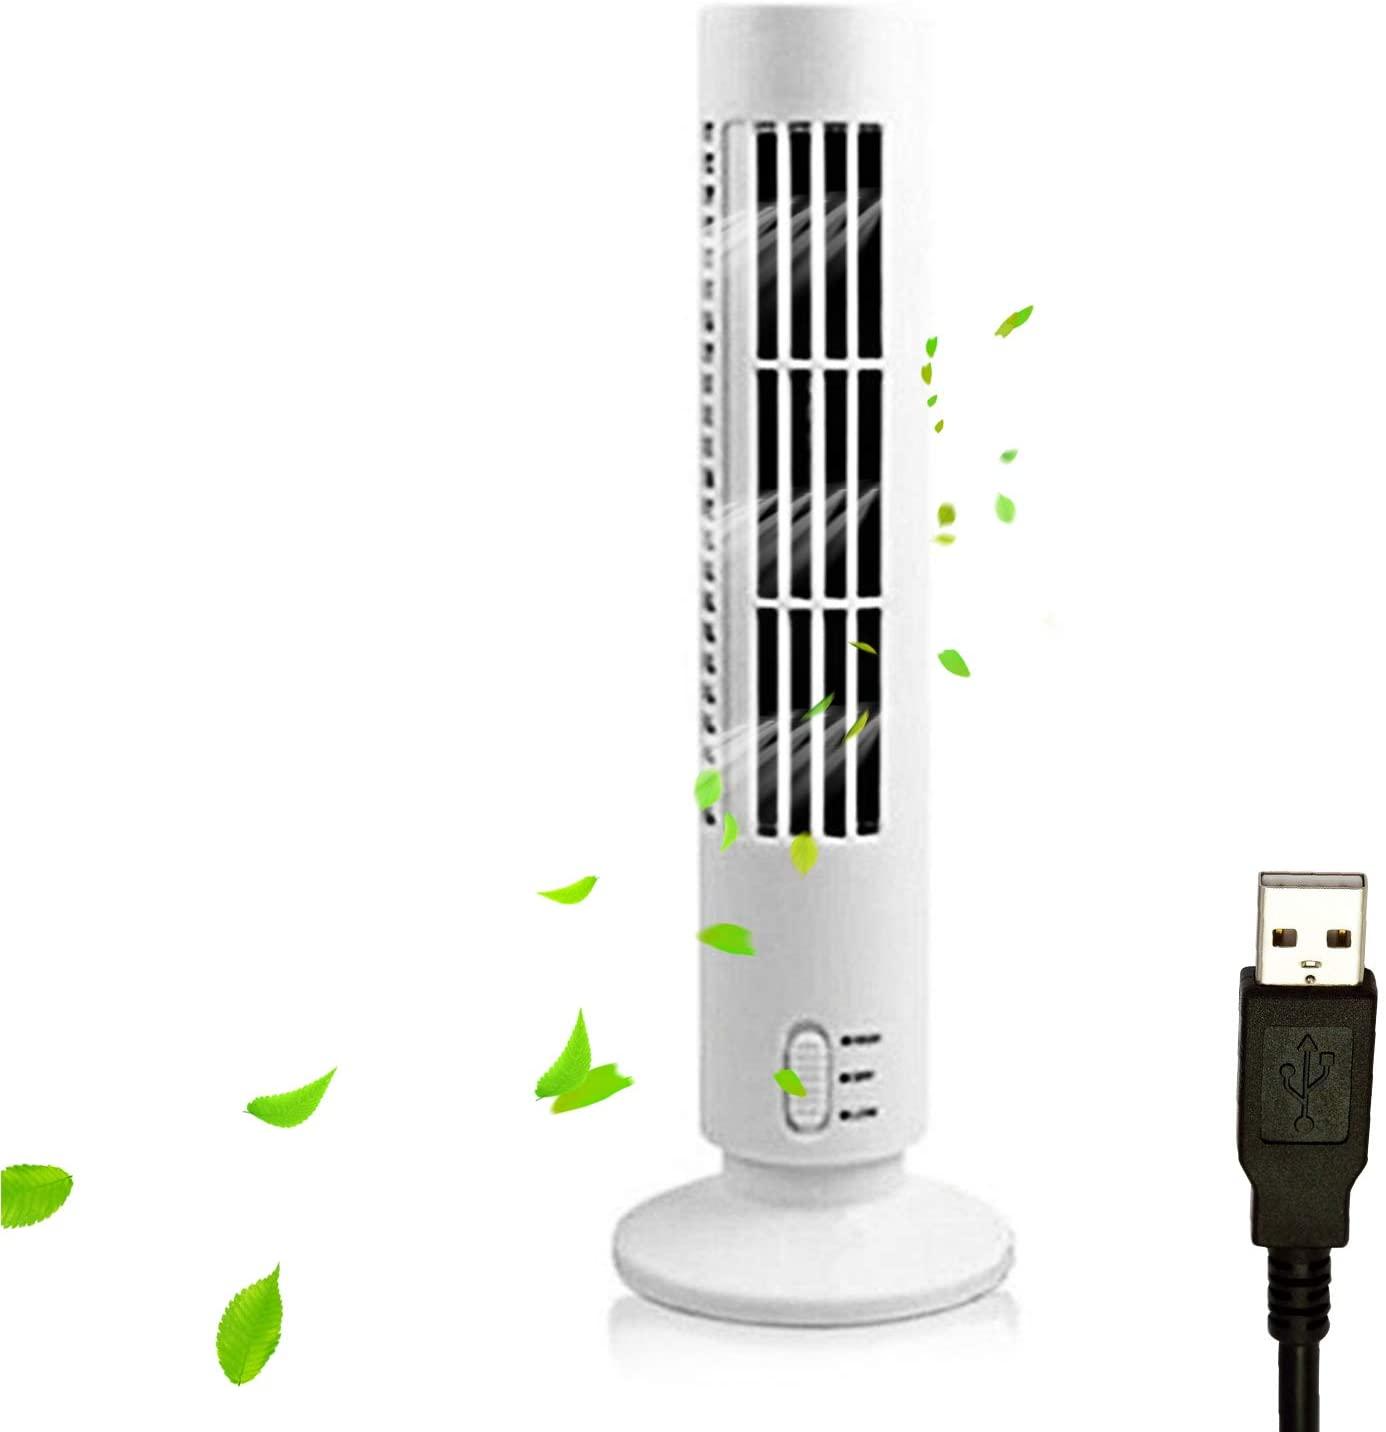 Ventilador de torre silencioso portátil USB para escritorio